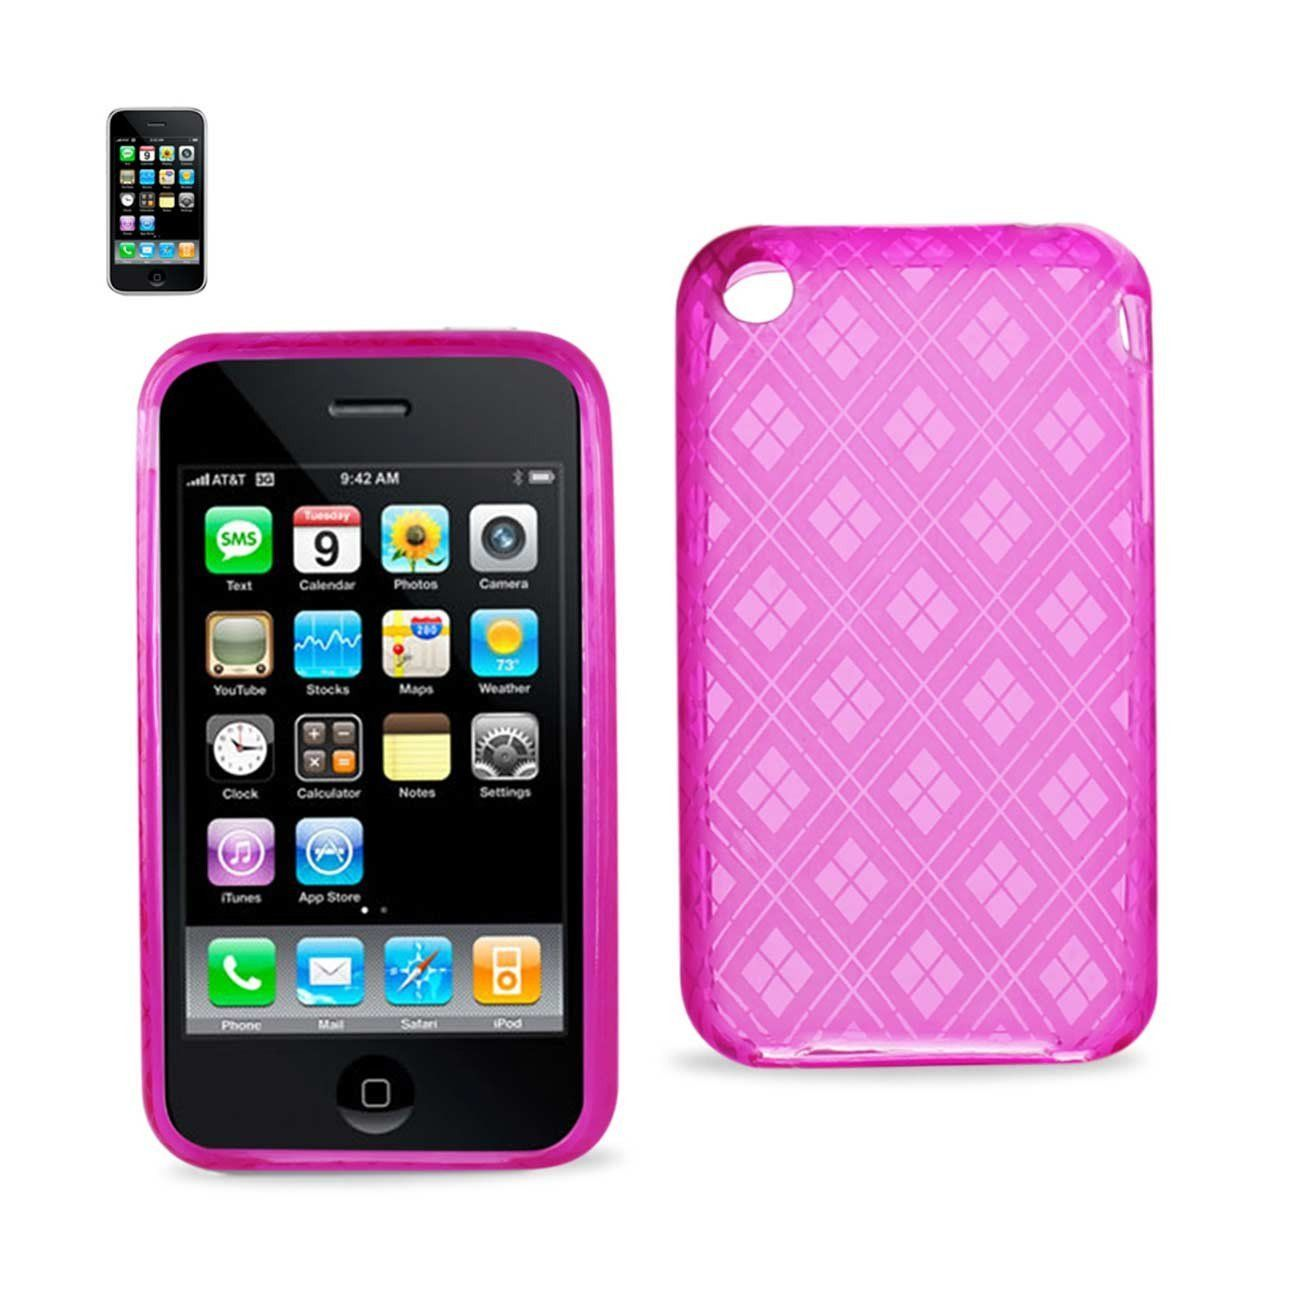 Reiko iPhone 3g/3gs Jelly Polymer Diamond Case Pink